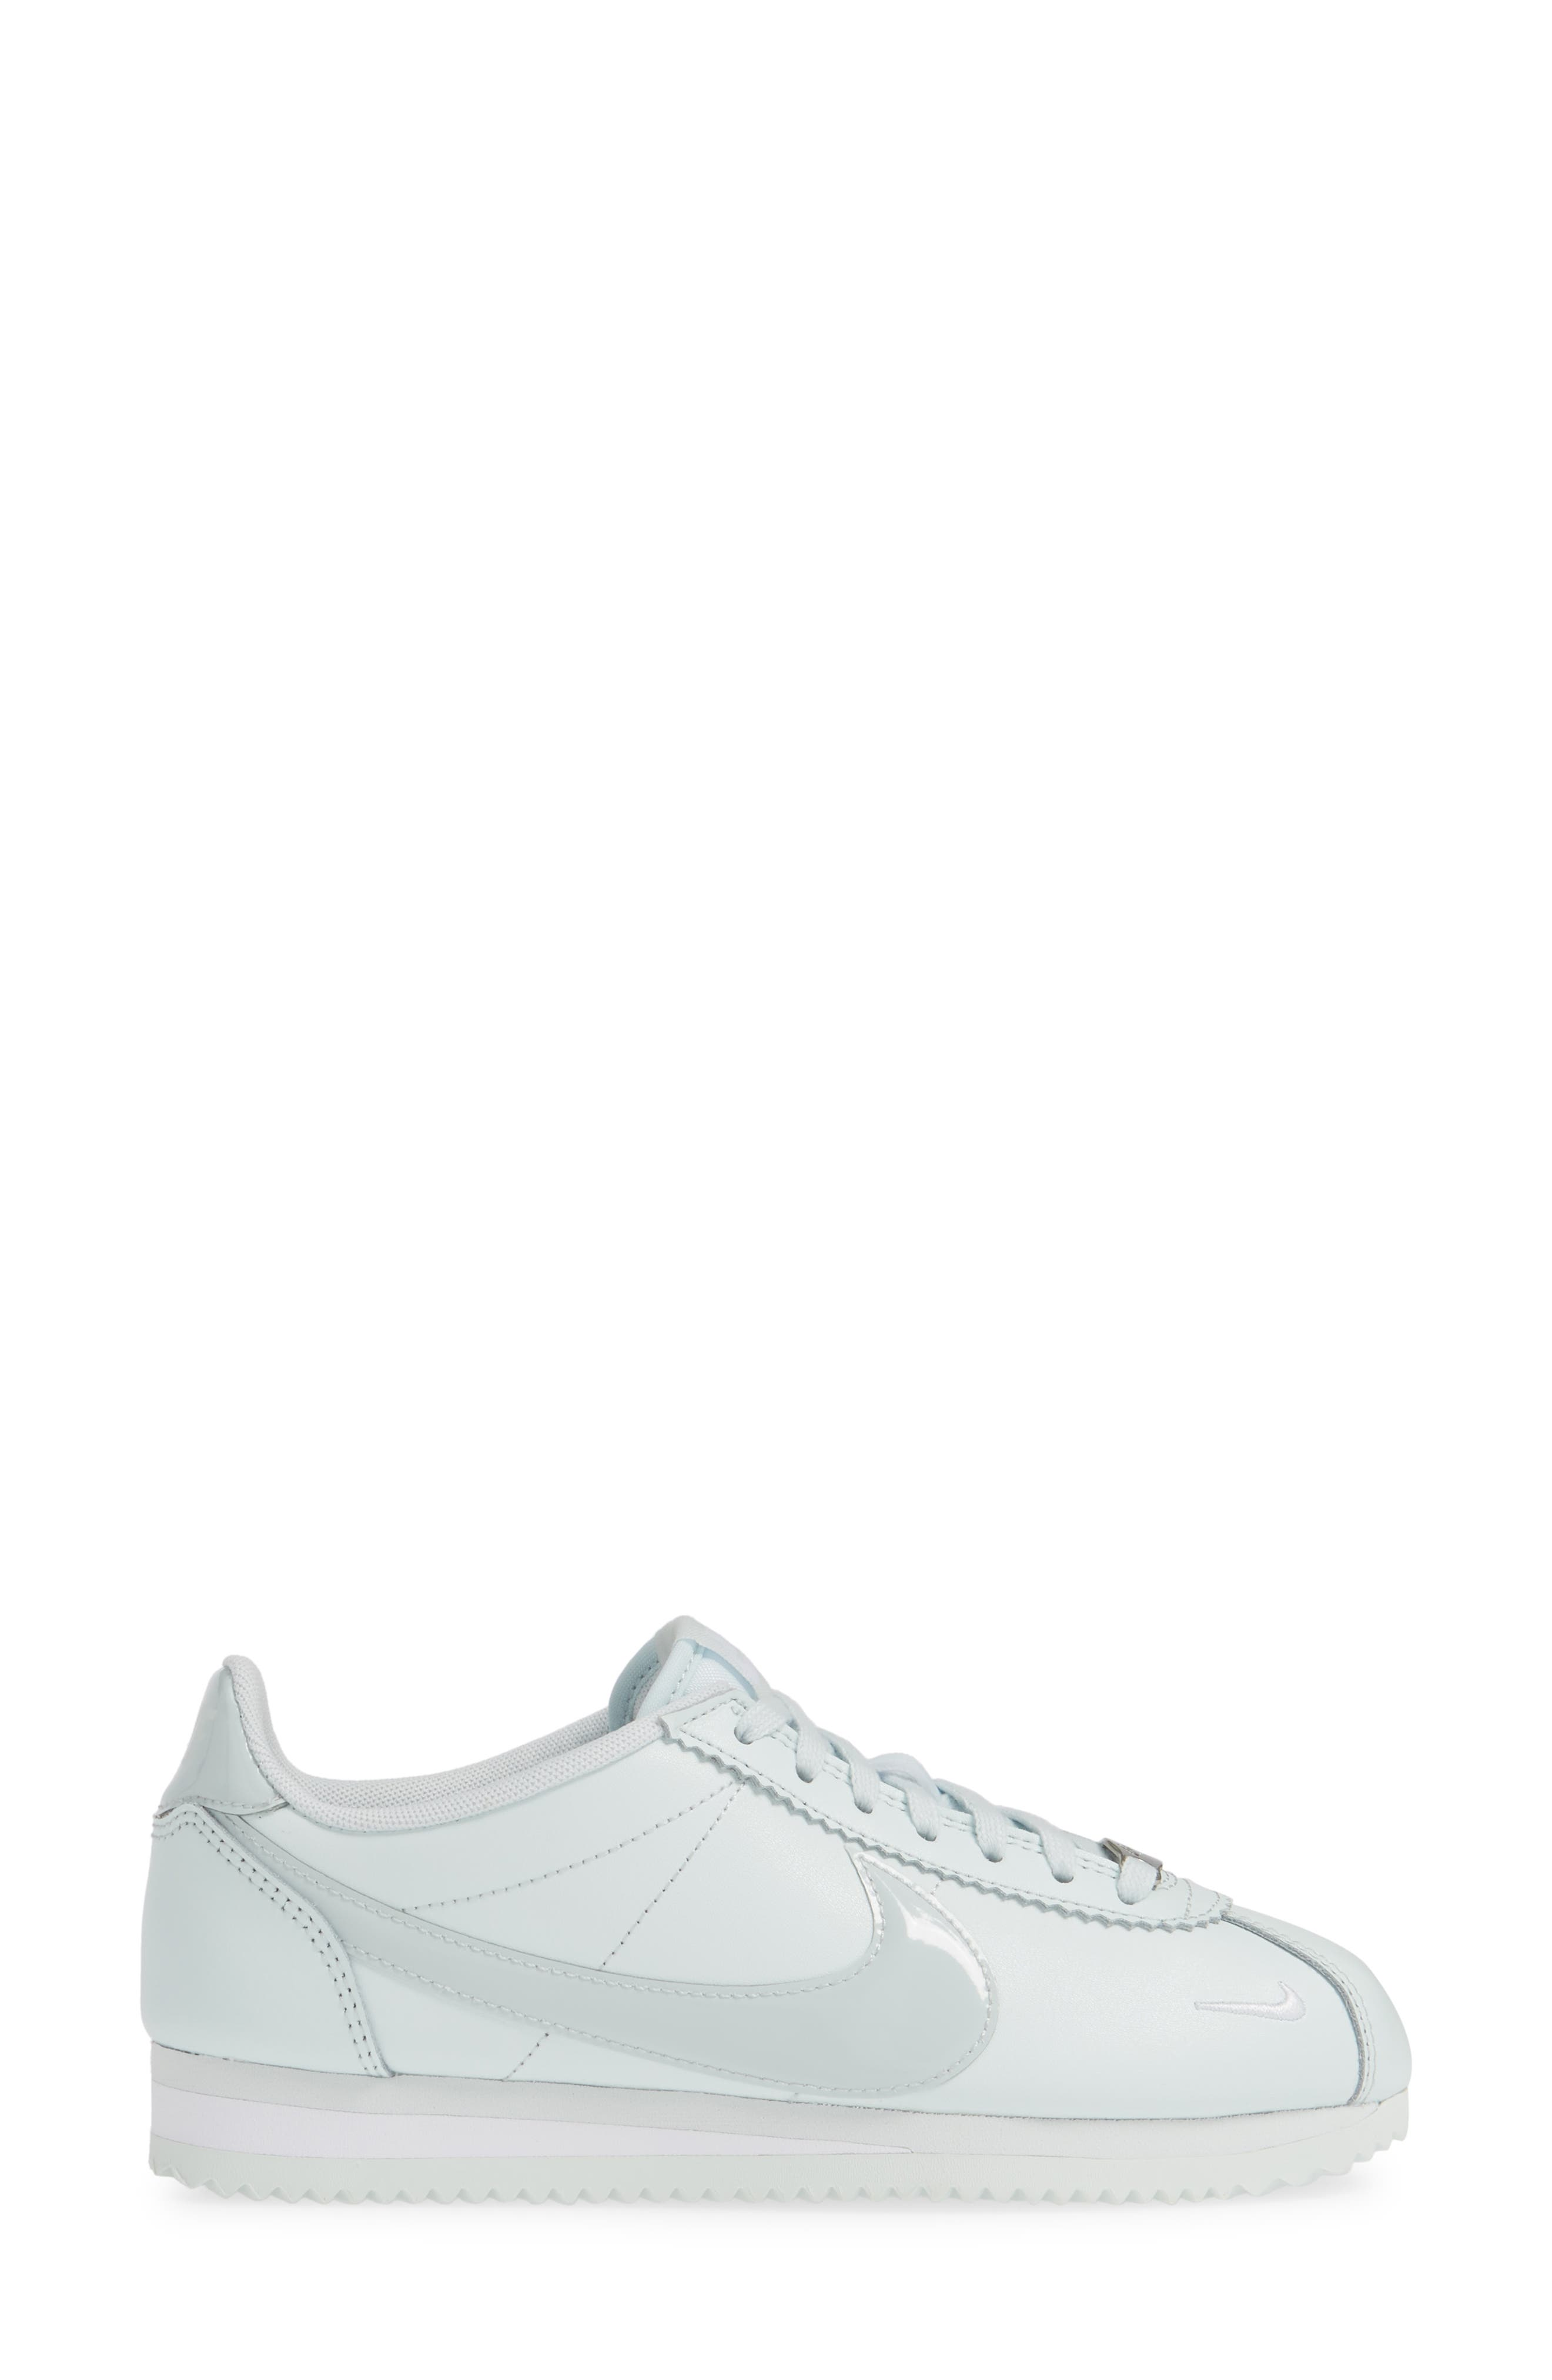 NIKE, Classic Cortez Premium XLV Sneaker, Alternate thumbnail 3, color, BARELY GREY/ WHITE